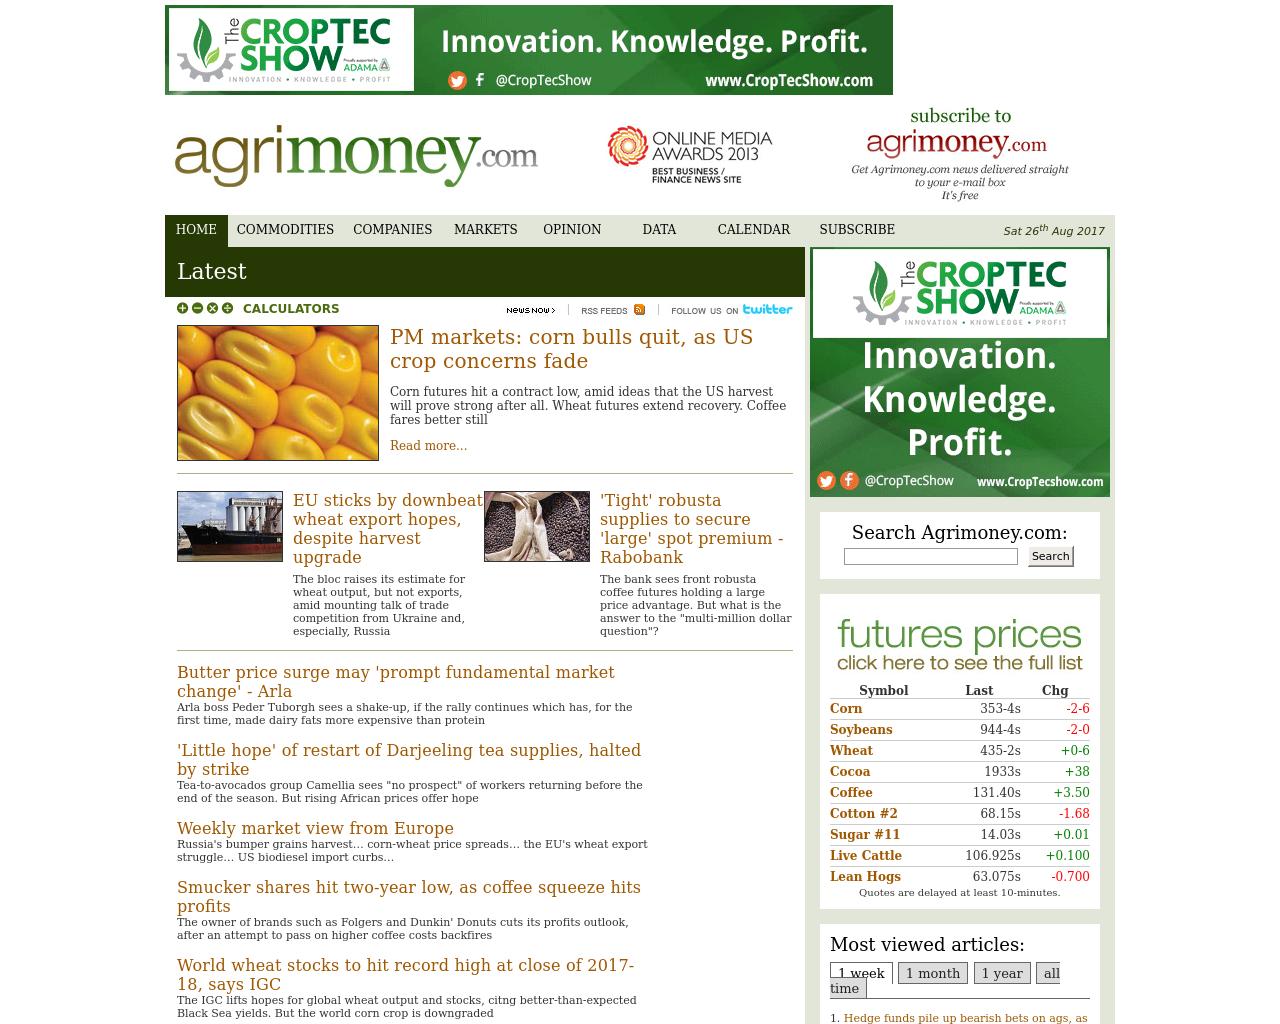 agrimoney.com-Advertising-Reviews-Pricing